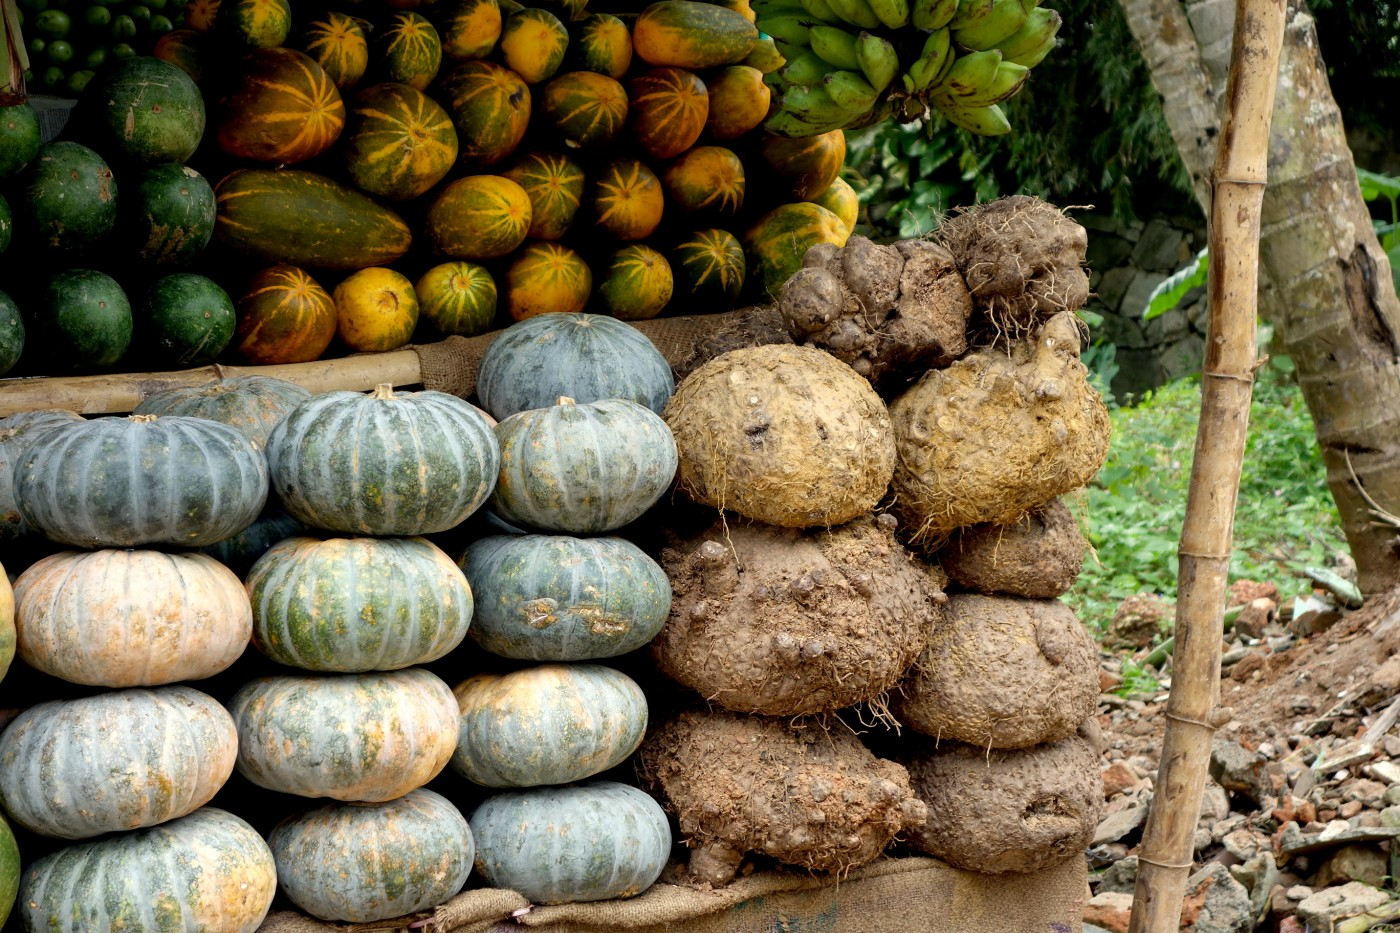 Pumpkin plays a versatile role in Bengali cuisine